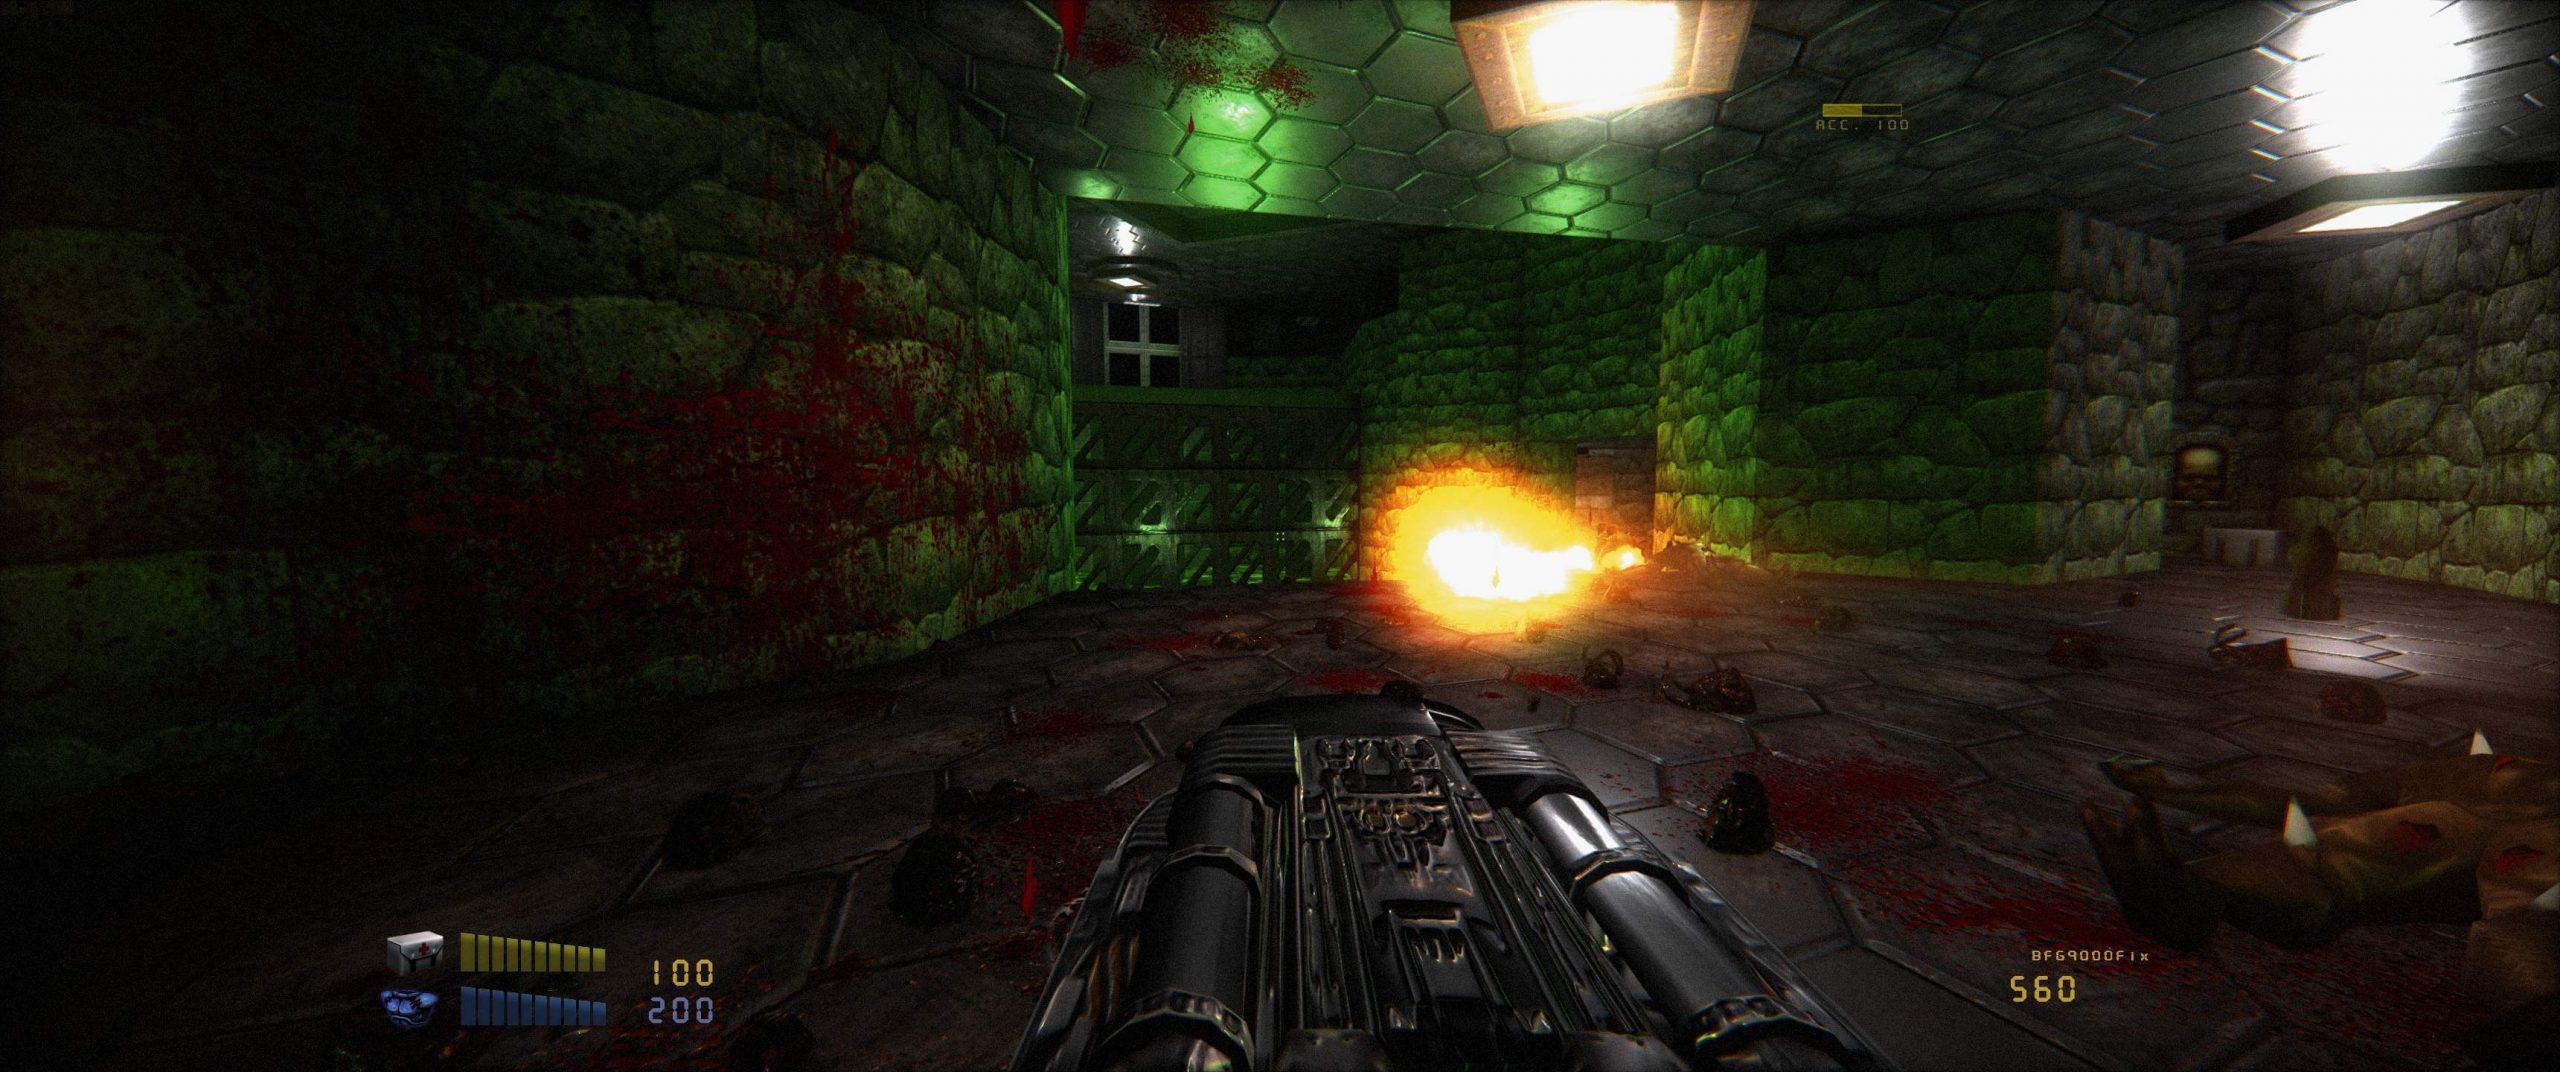 Experimental Doom Remake 4 version adds more lights, improves PBR materials, supports Vulkan API